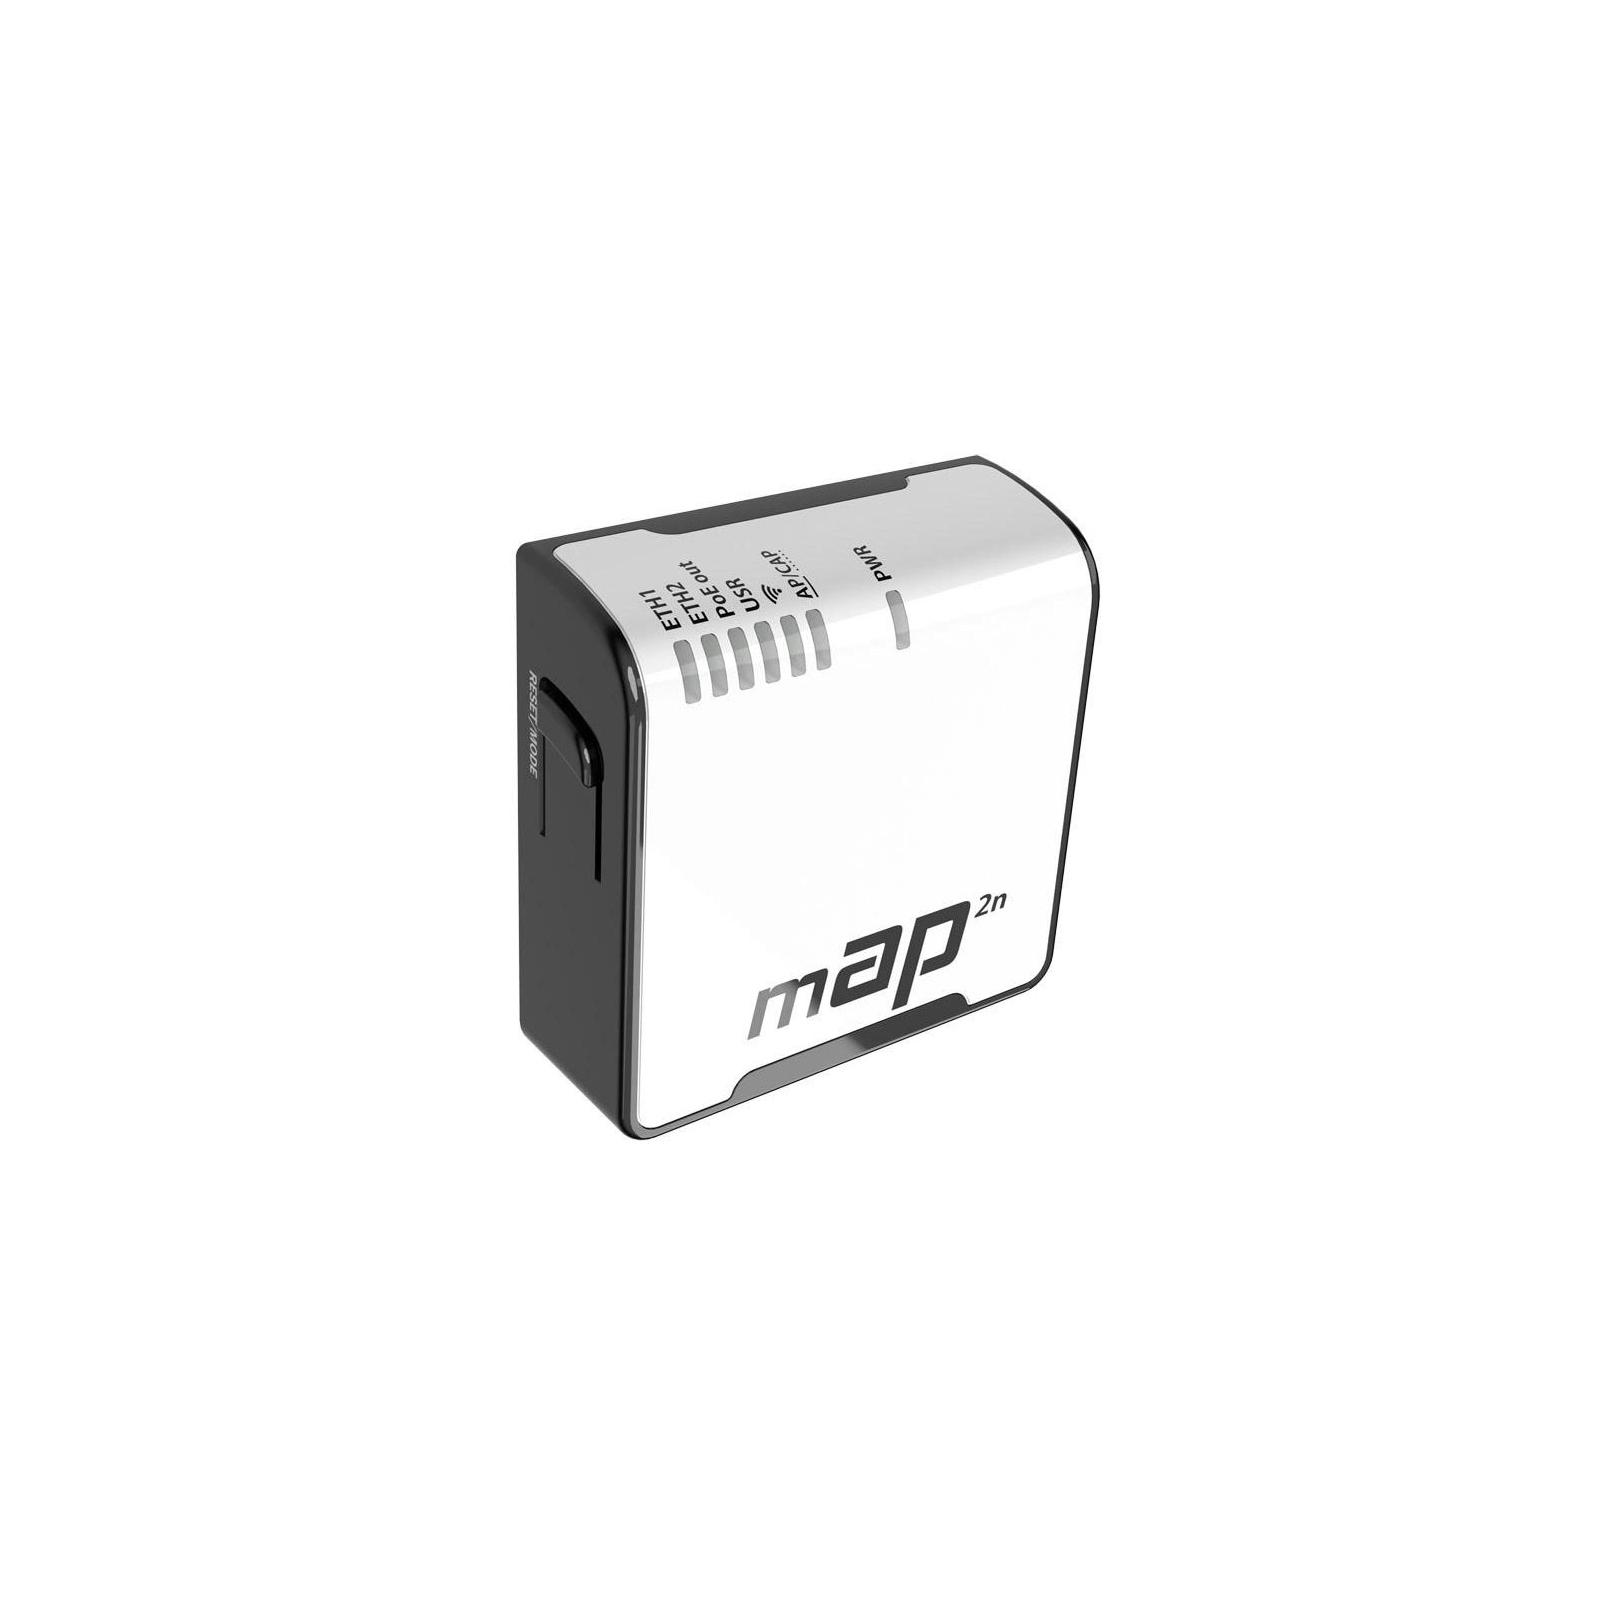 Точка доступа Wi-Fi Mikrotik RBmAP2n изображение 3